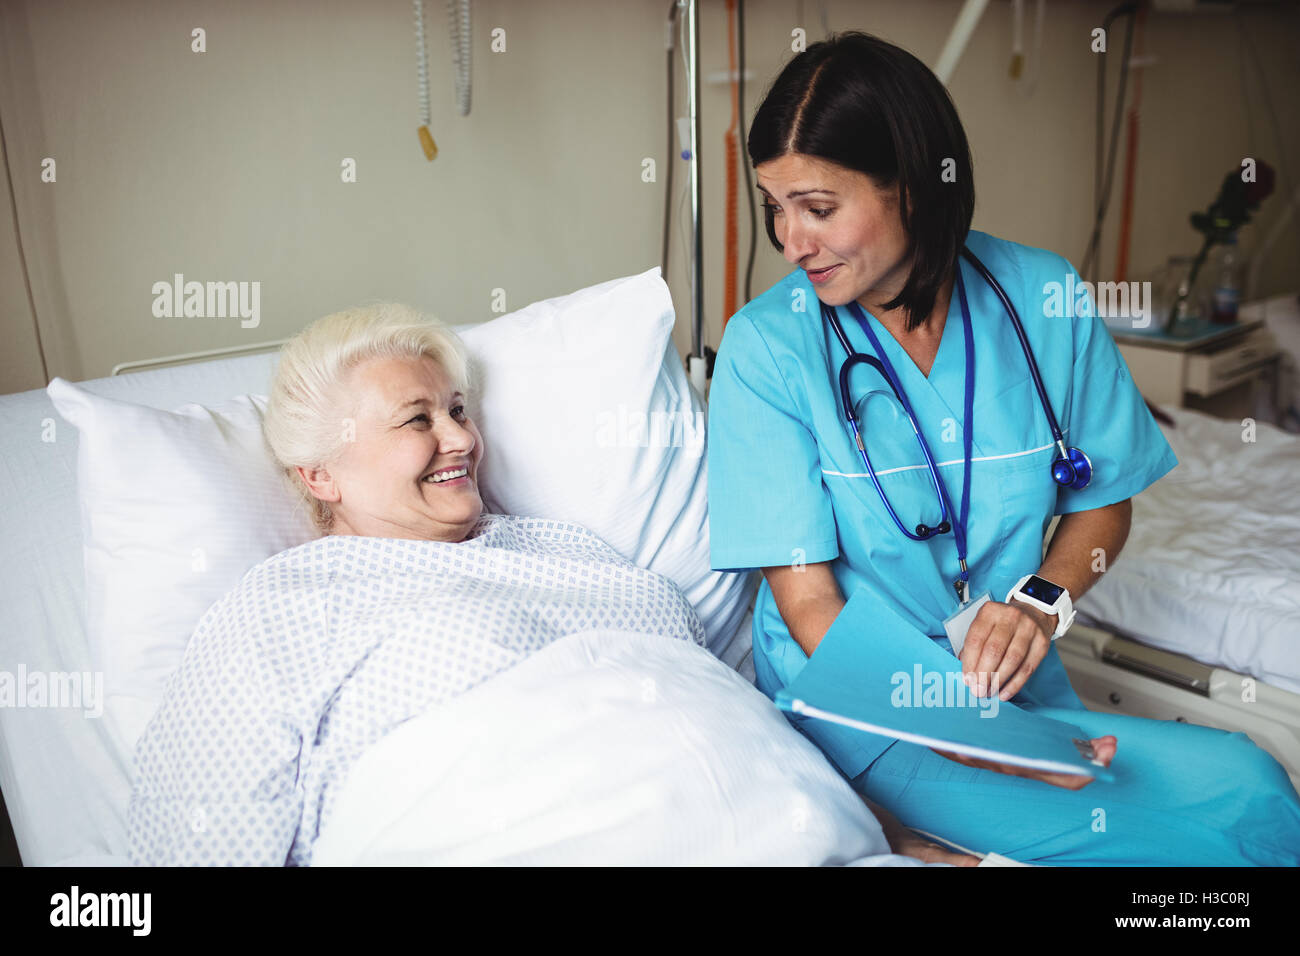 Nurse interacting with senior patient - Stock Image